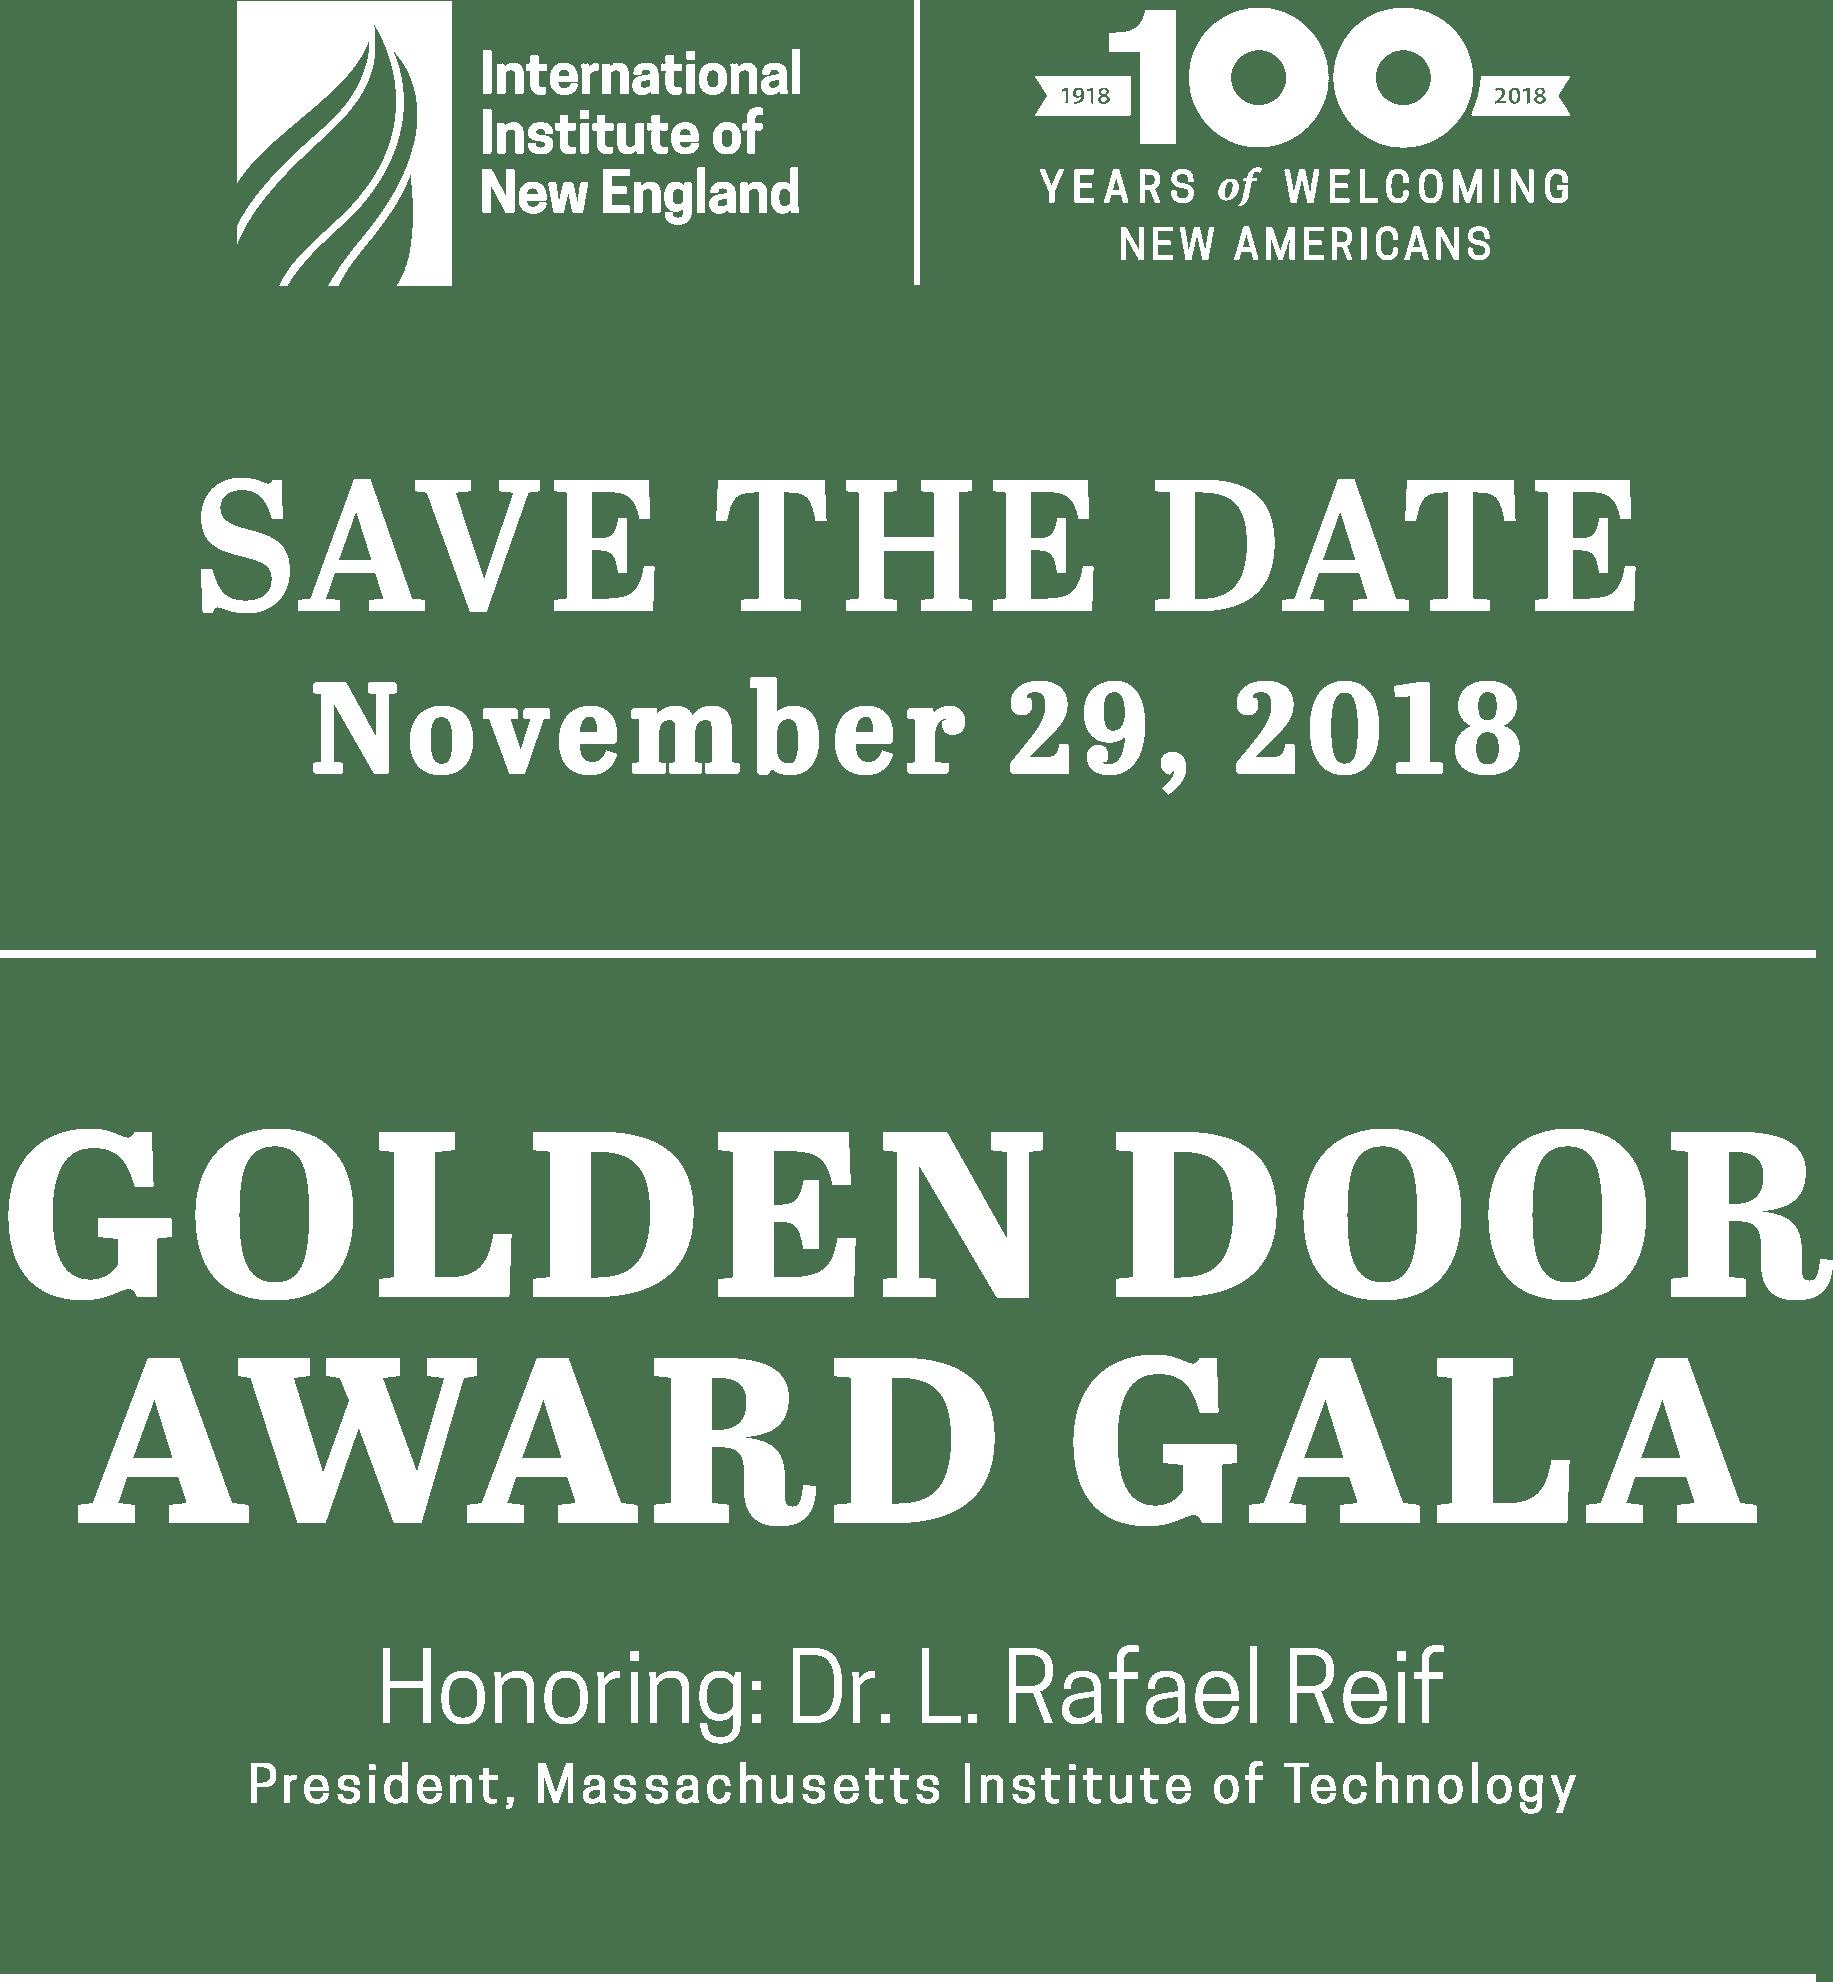 November 29, 2018 Golden Door Award Gala